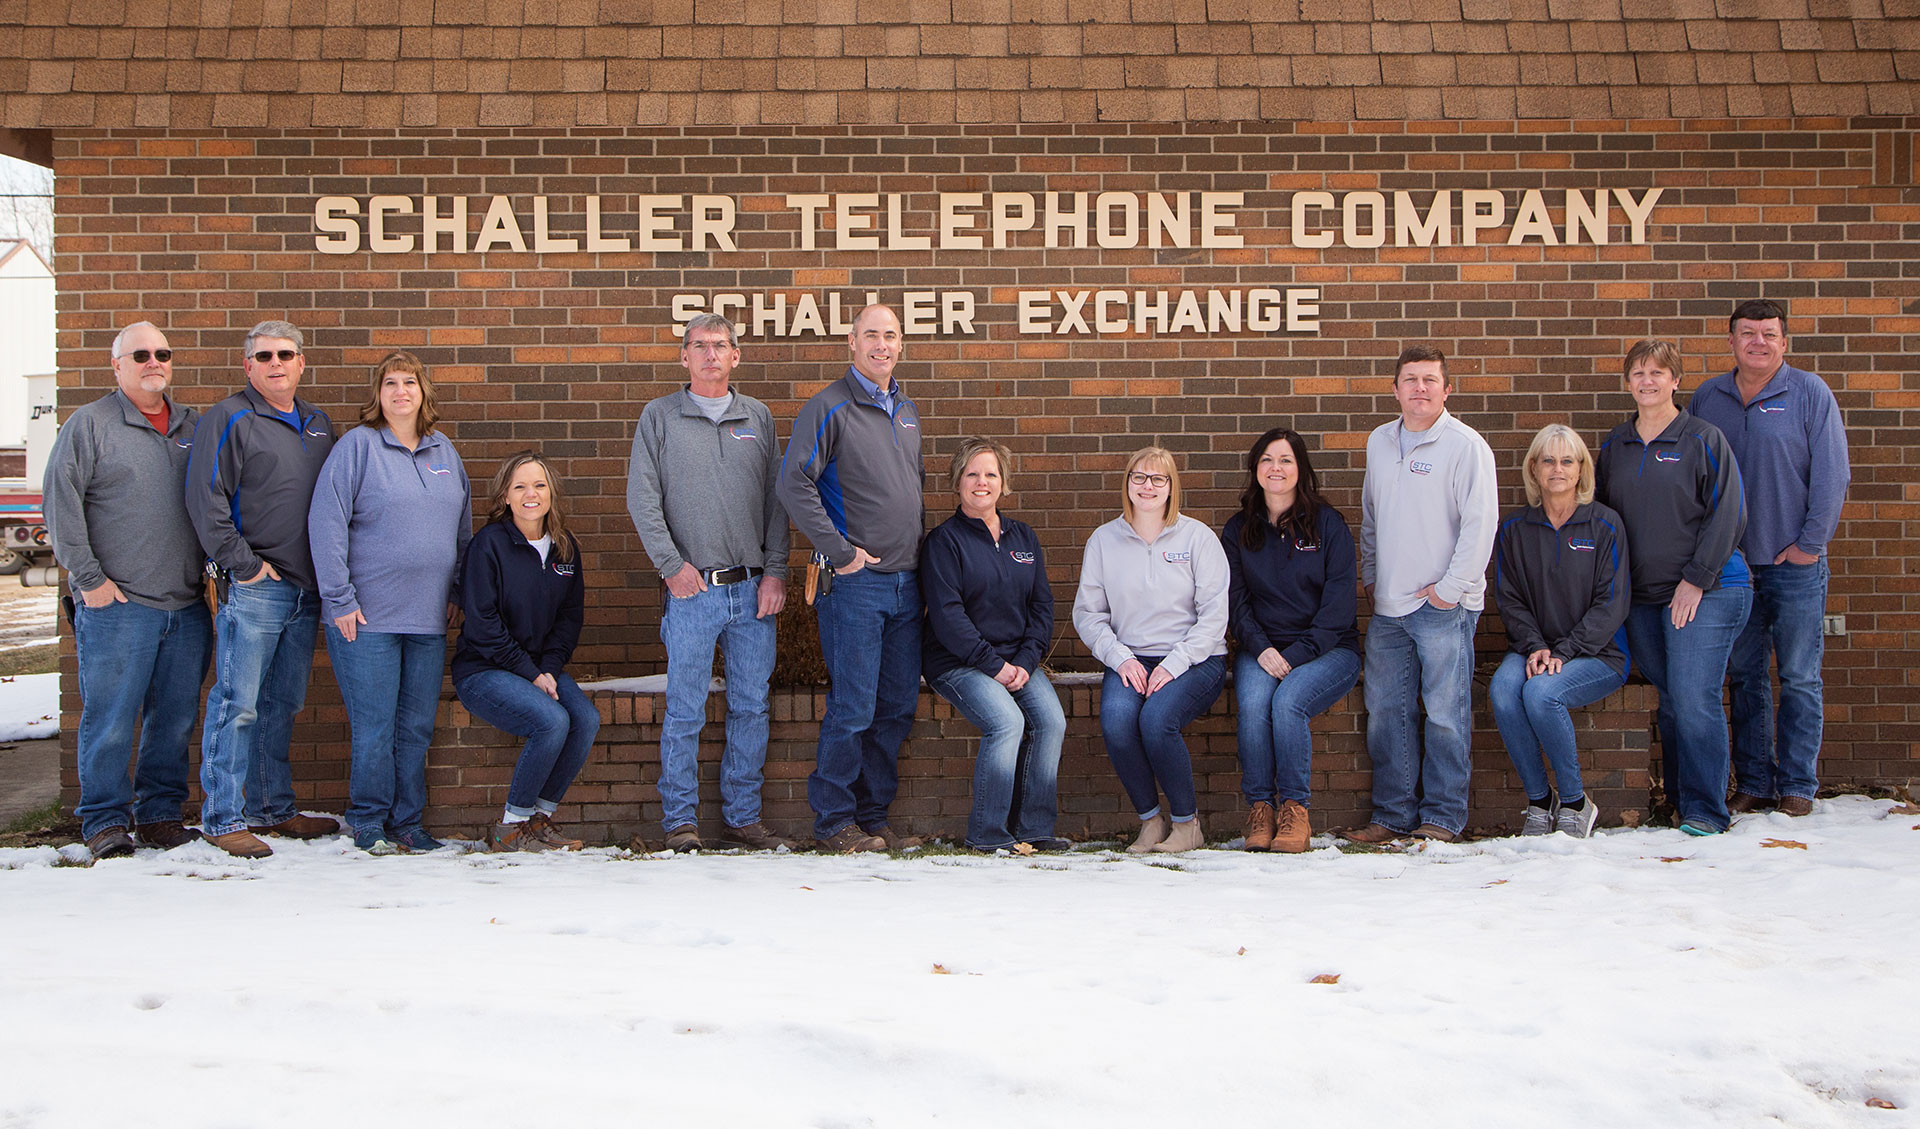 The Schaller Telephone Company Team